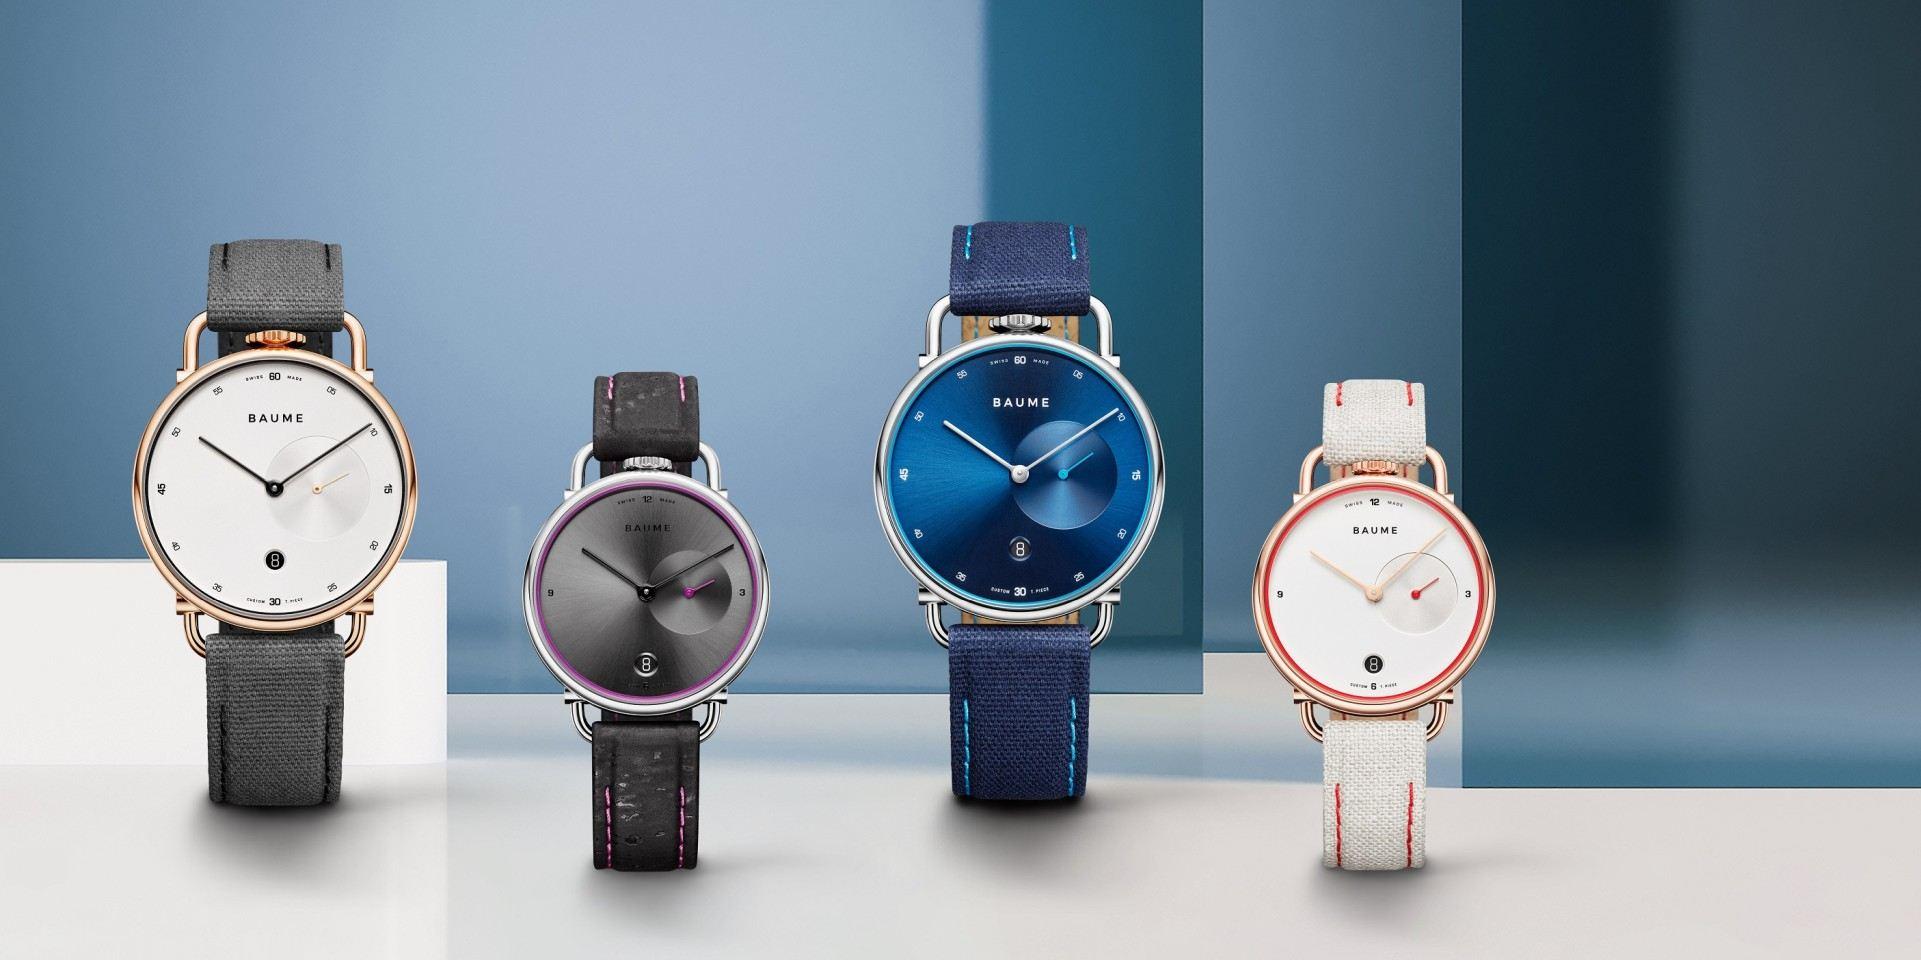 BAUME & MERCIER 名士錶隆重發佈全新 BAUME 奔系列腕錶